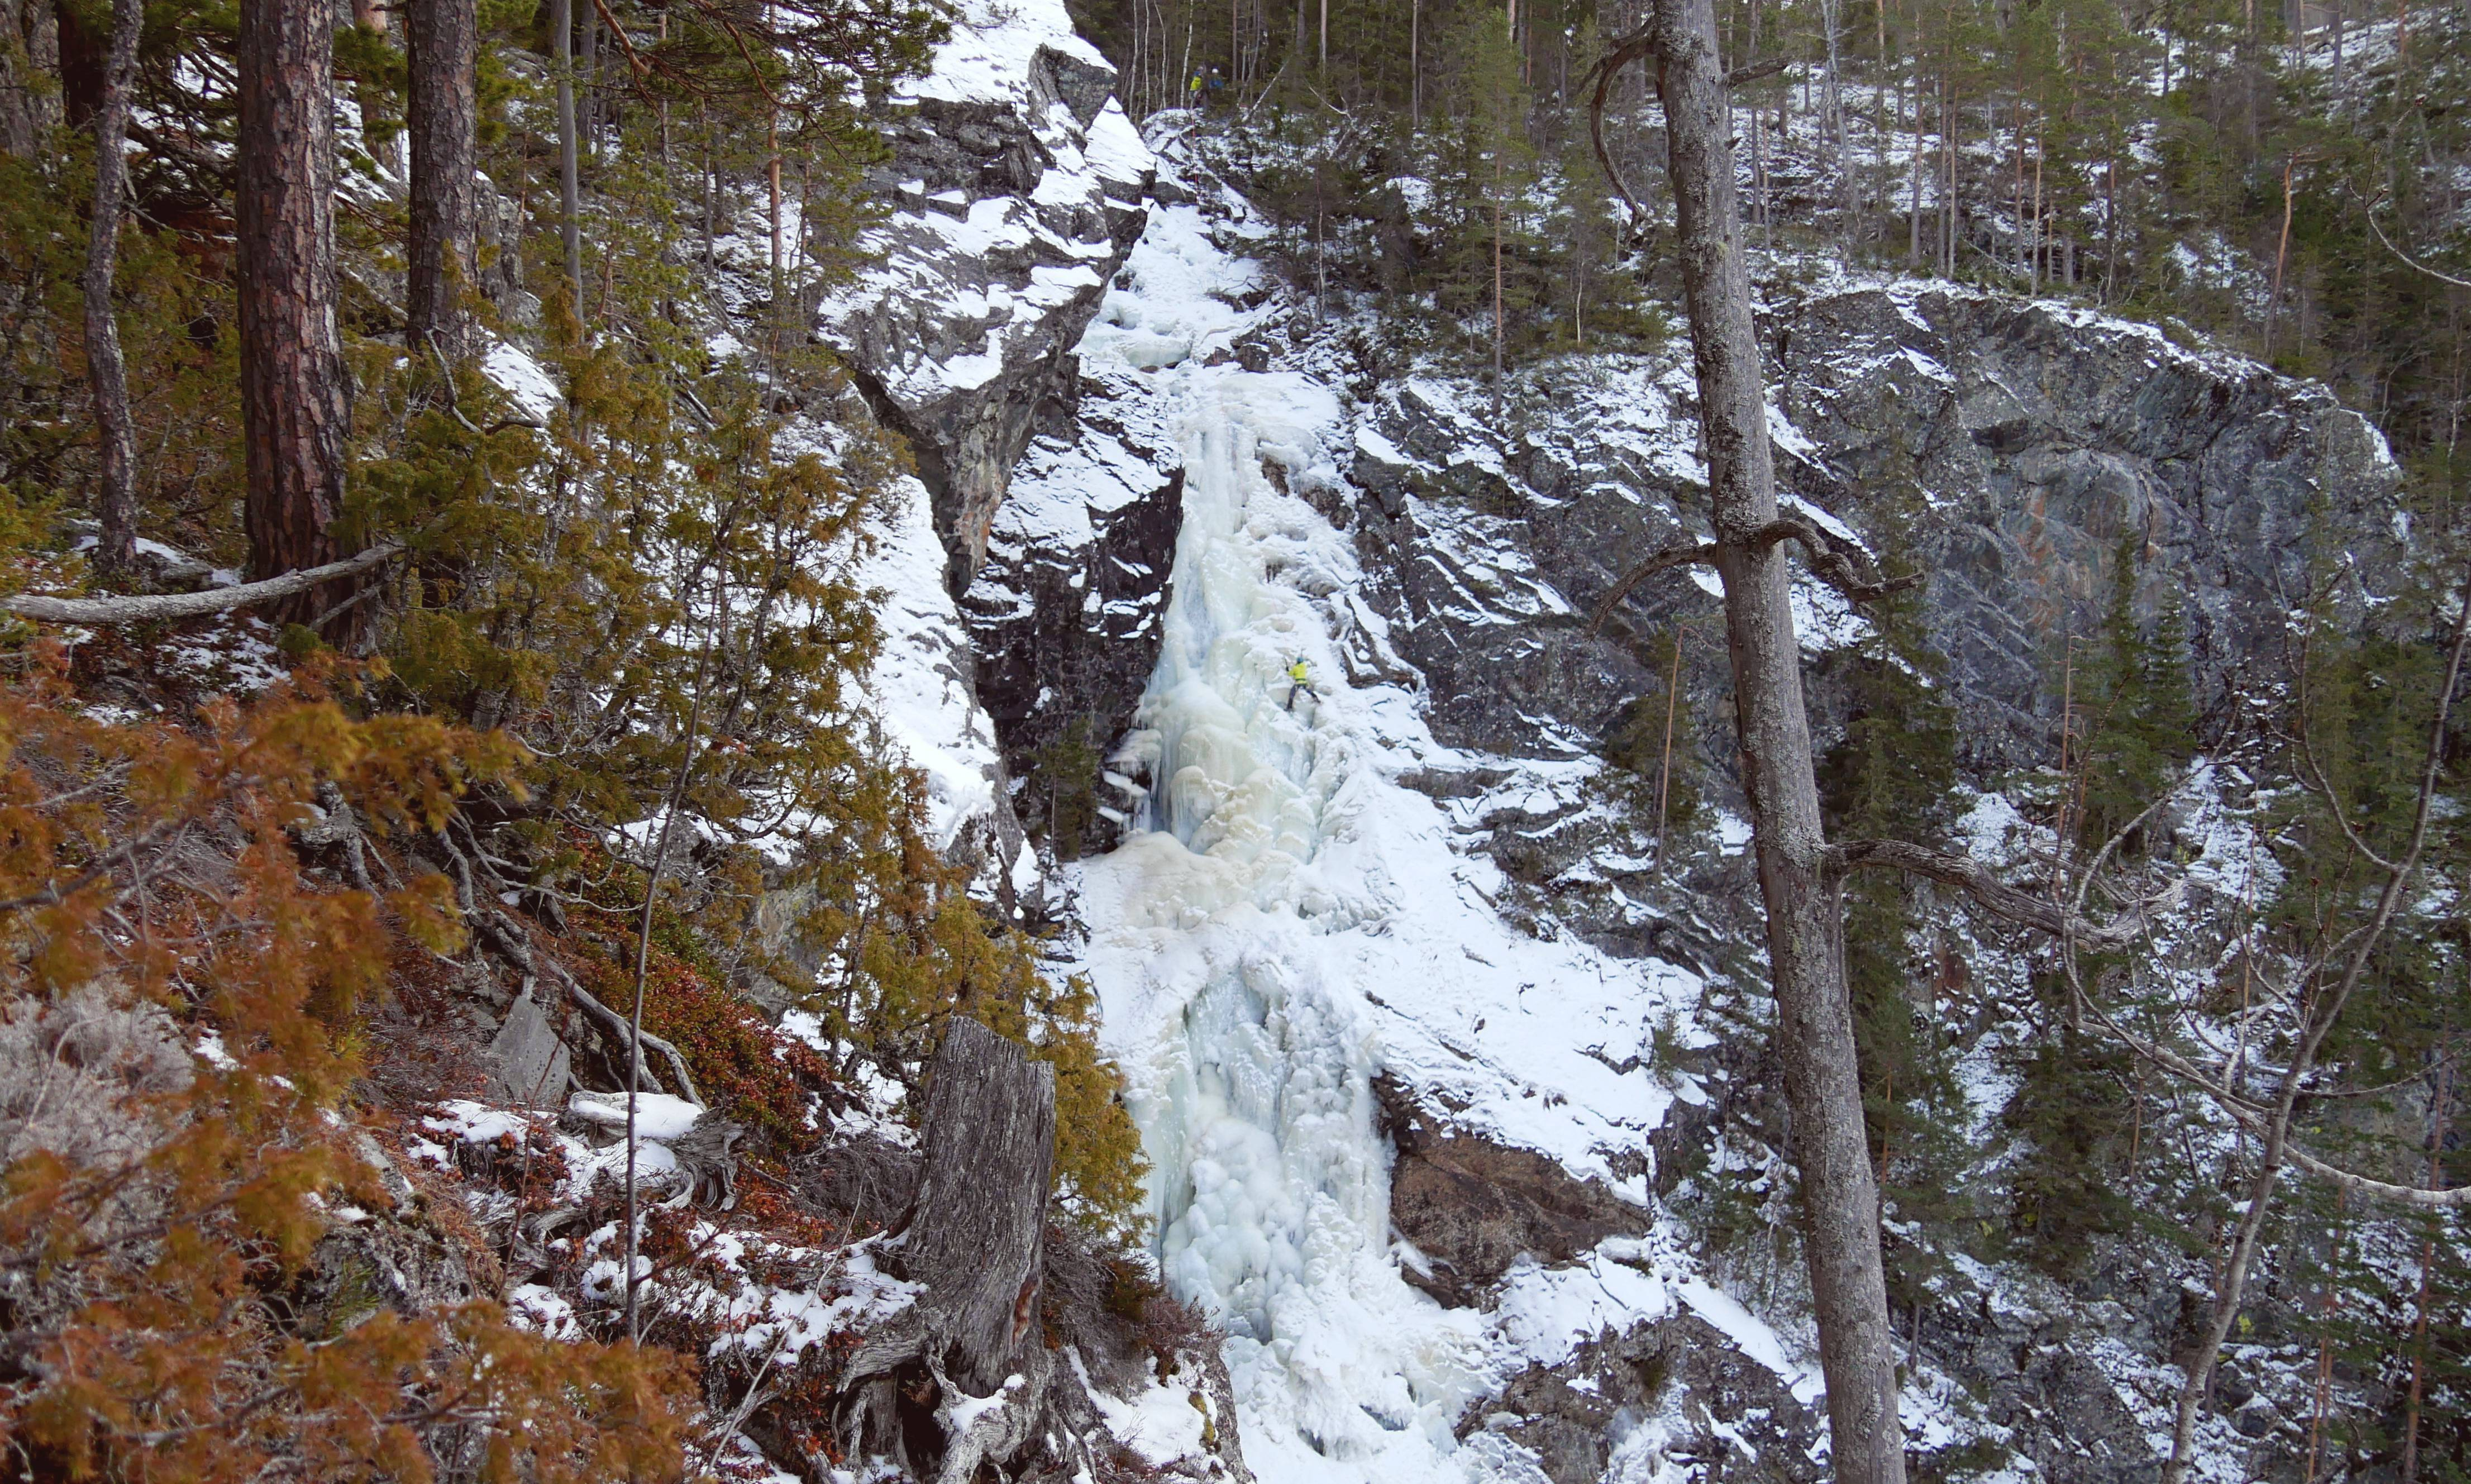 Joikaer i Rjukan